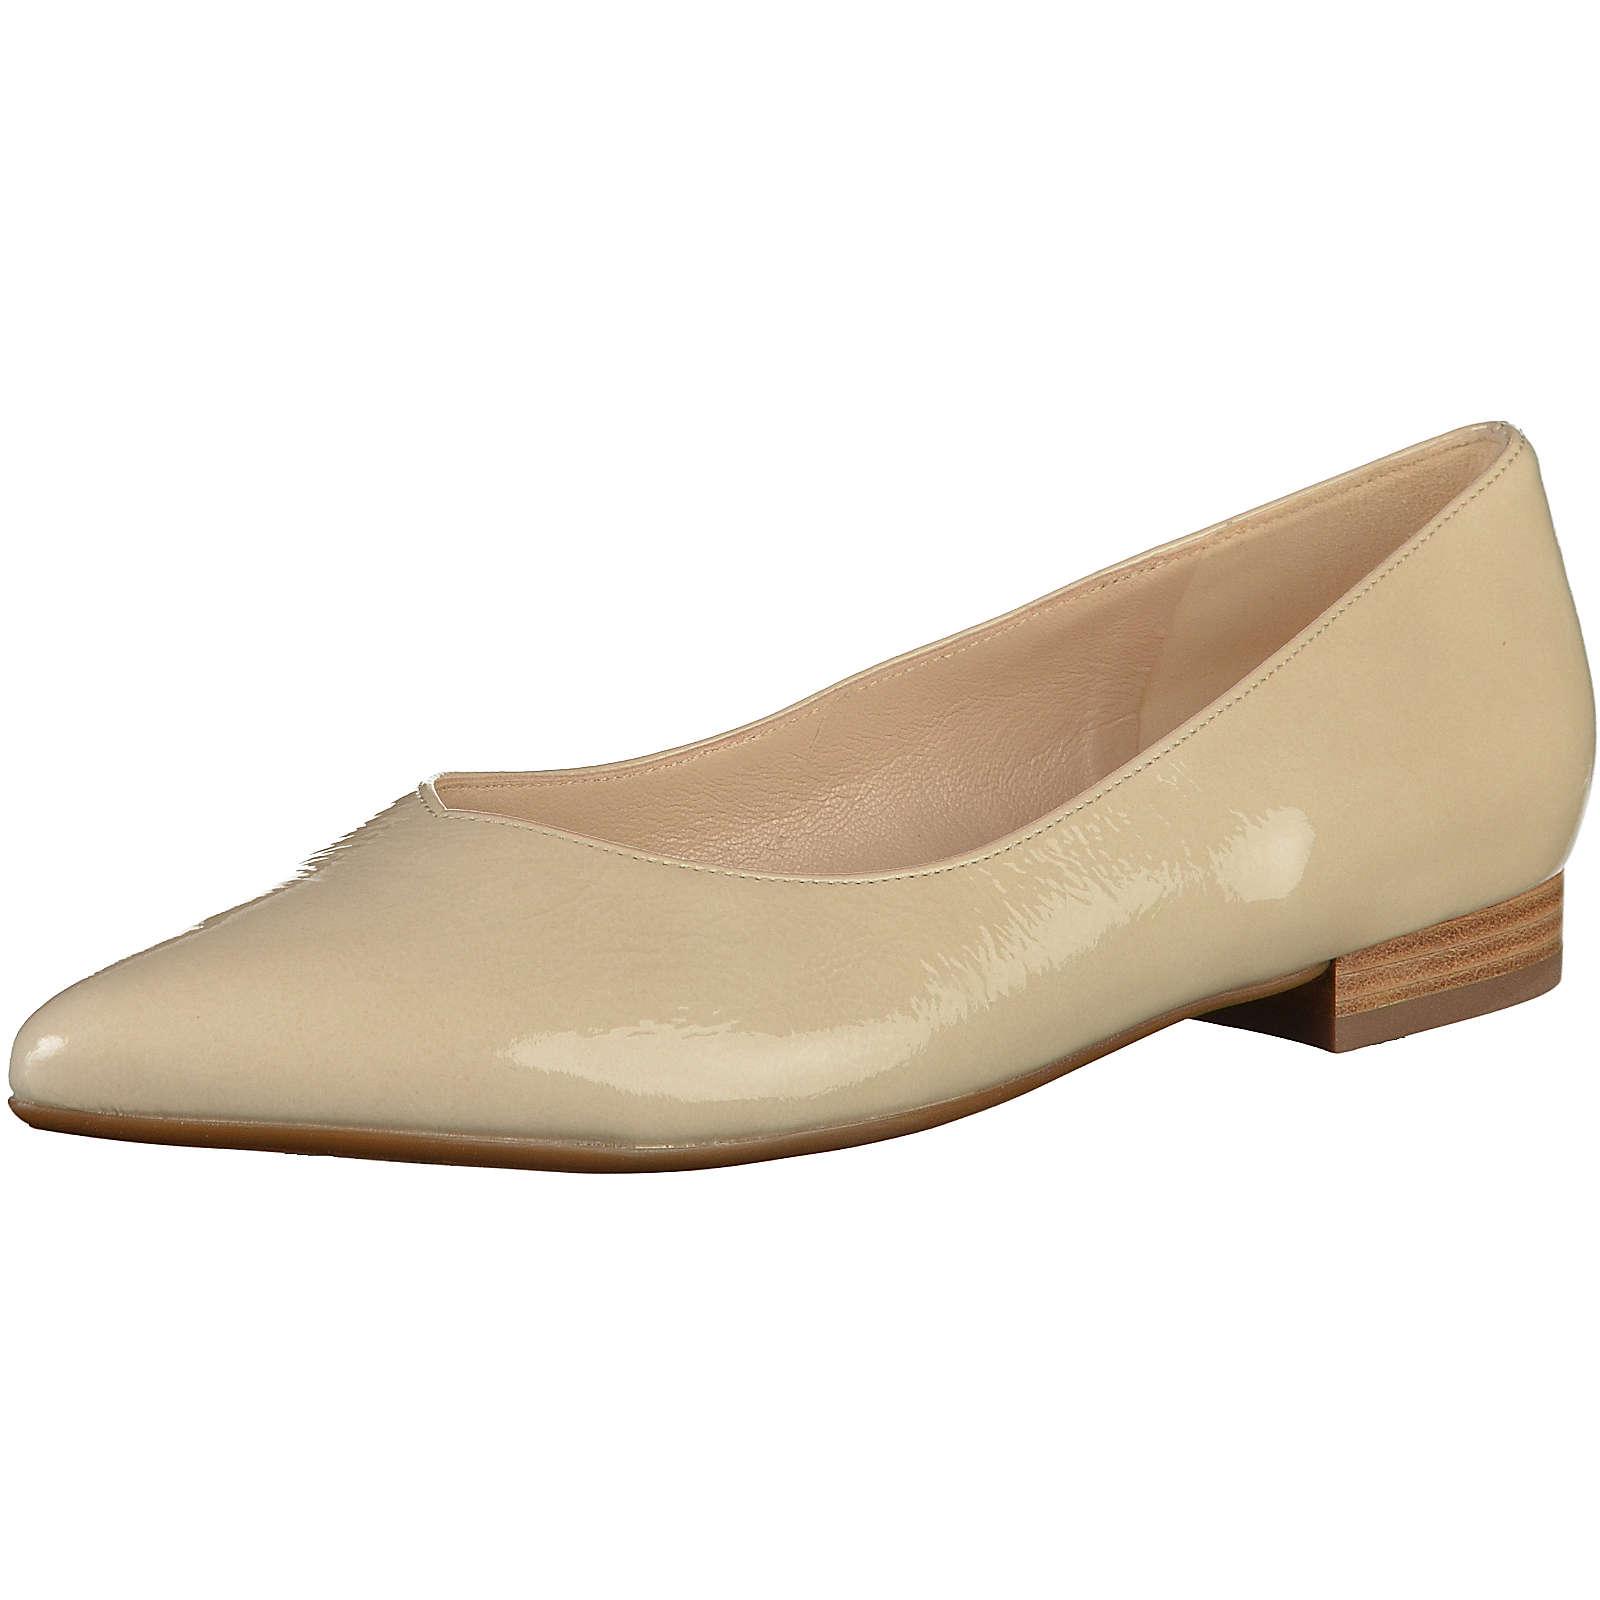 4fea982d735184 Rabatt-Preisvergleich.de - Schuhe   Ballerinas   Klassische Ballerinas